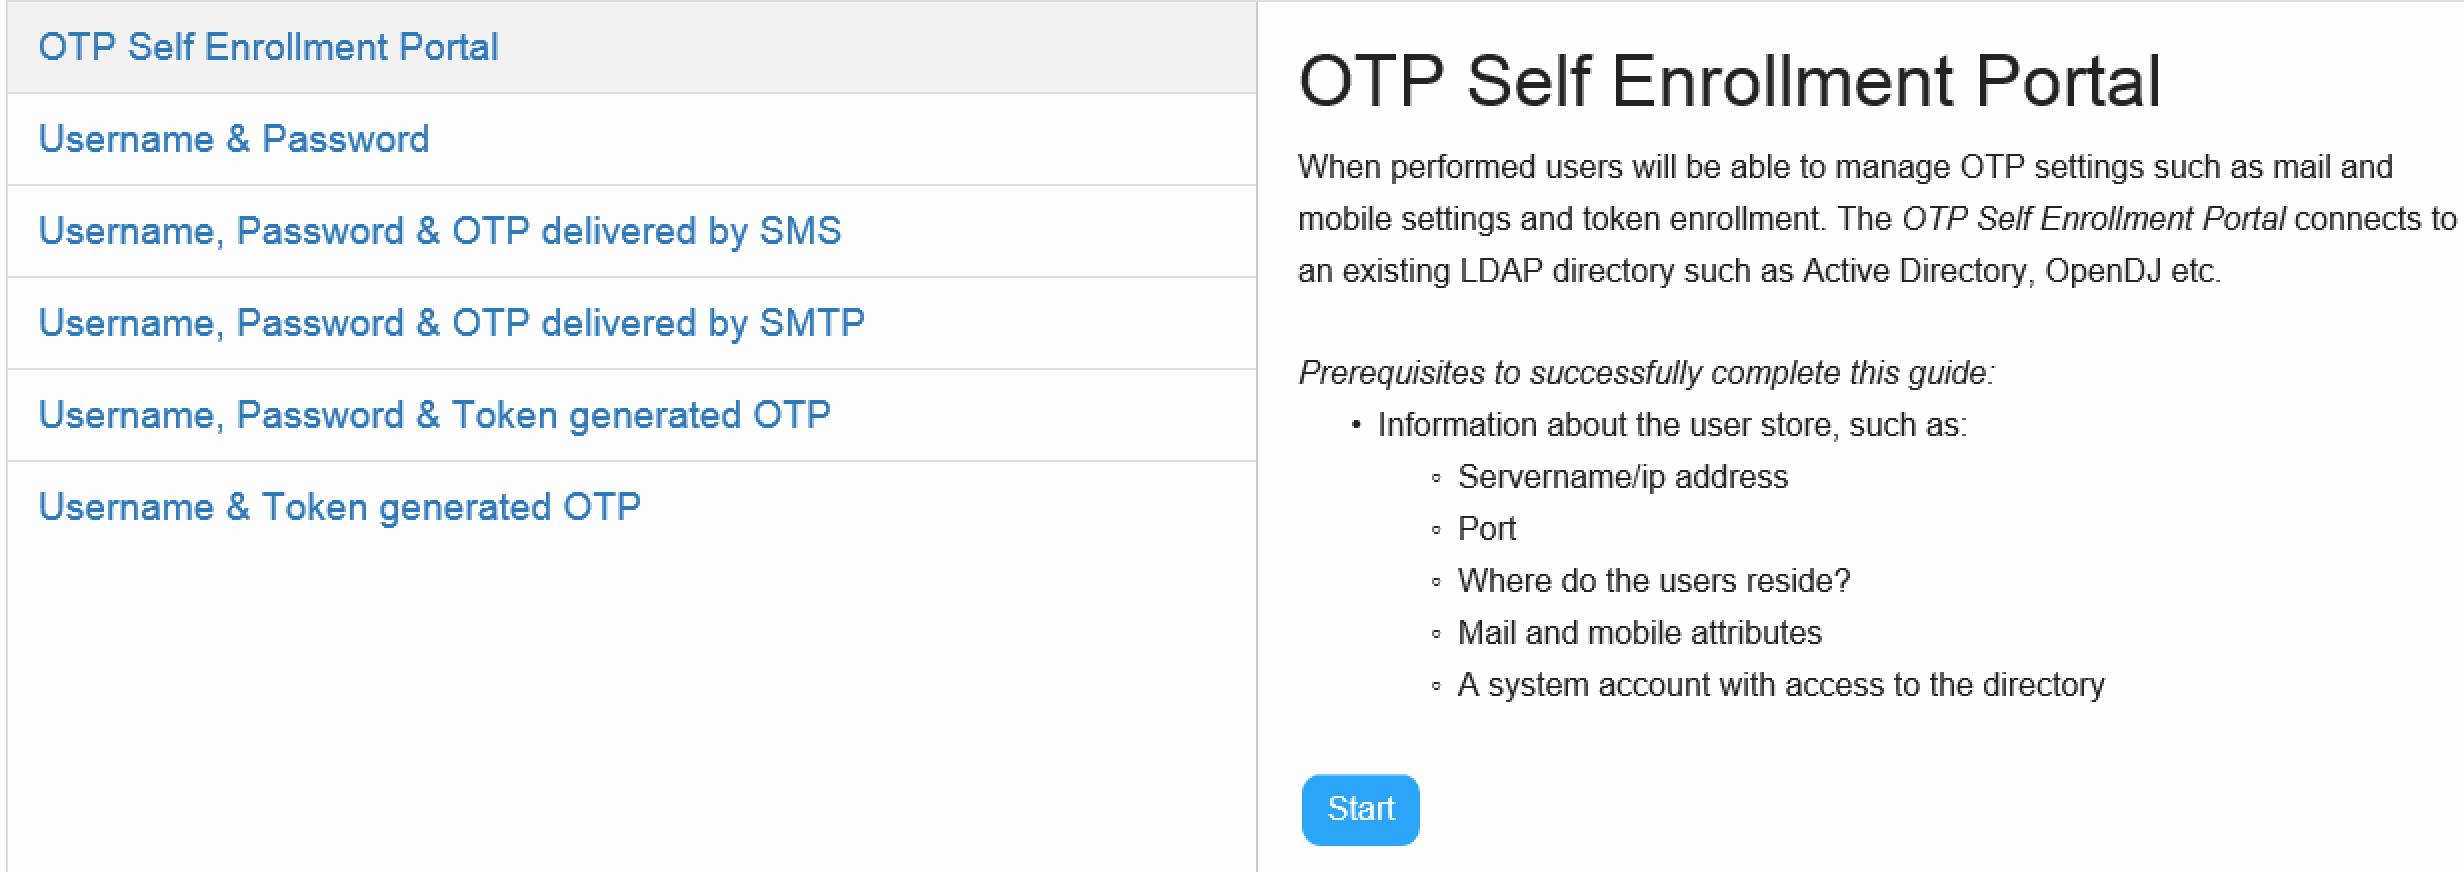 Step by Step – Configure OTP Self Enrollment Portal – PhenixID Support